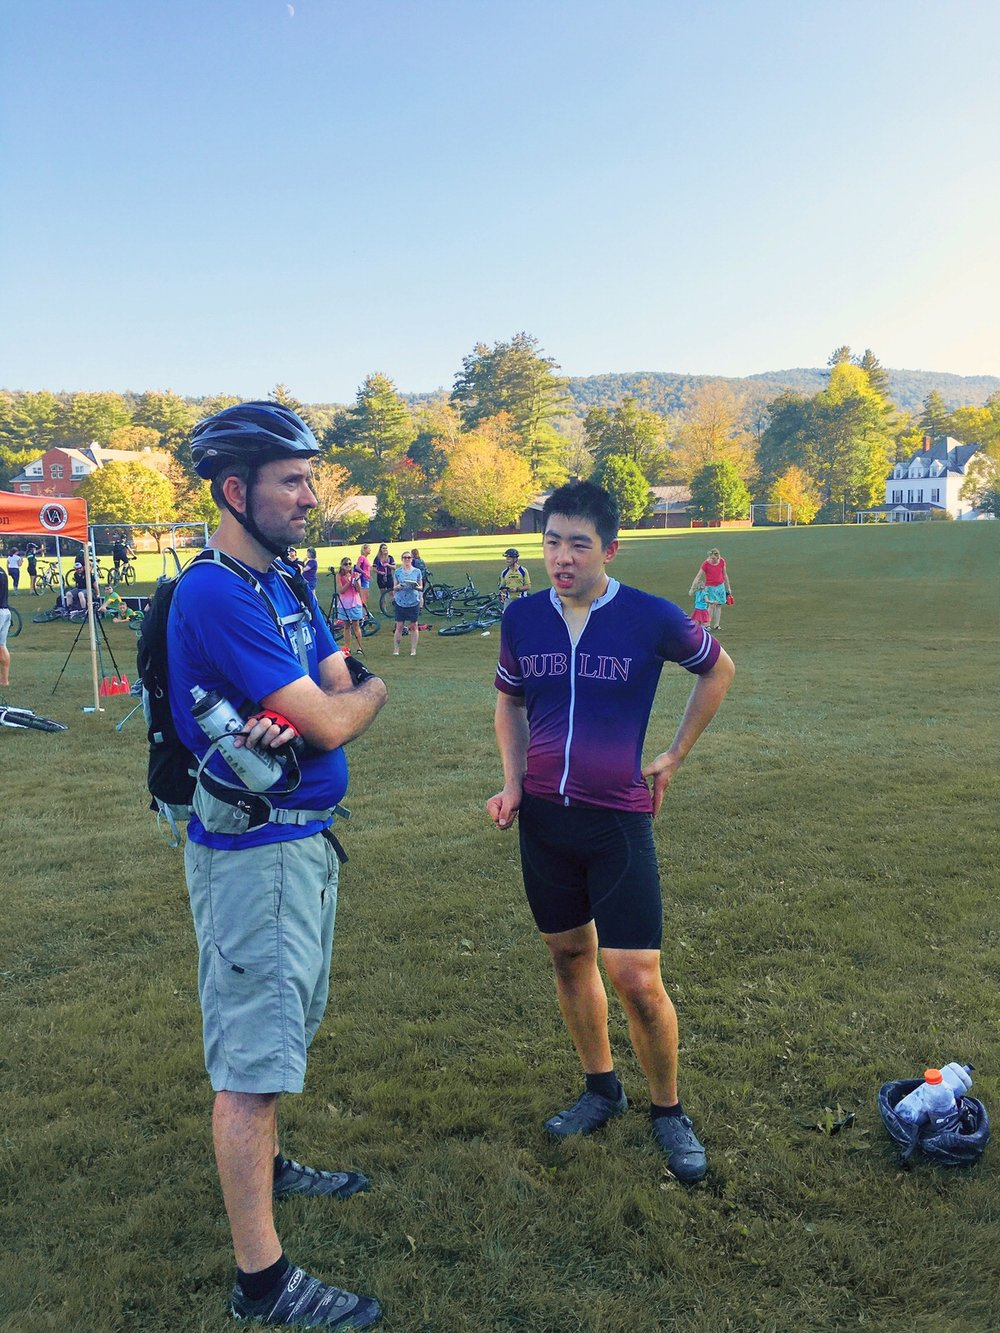 Mountain Biking at Vermont Academy - September 27, 2017  - 8019.JPG